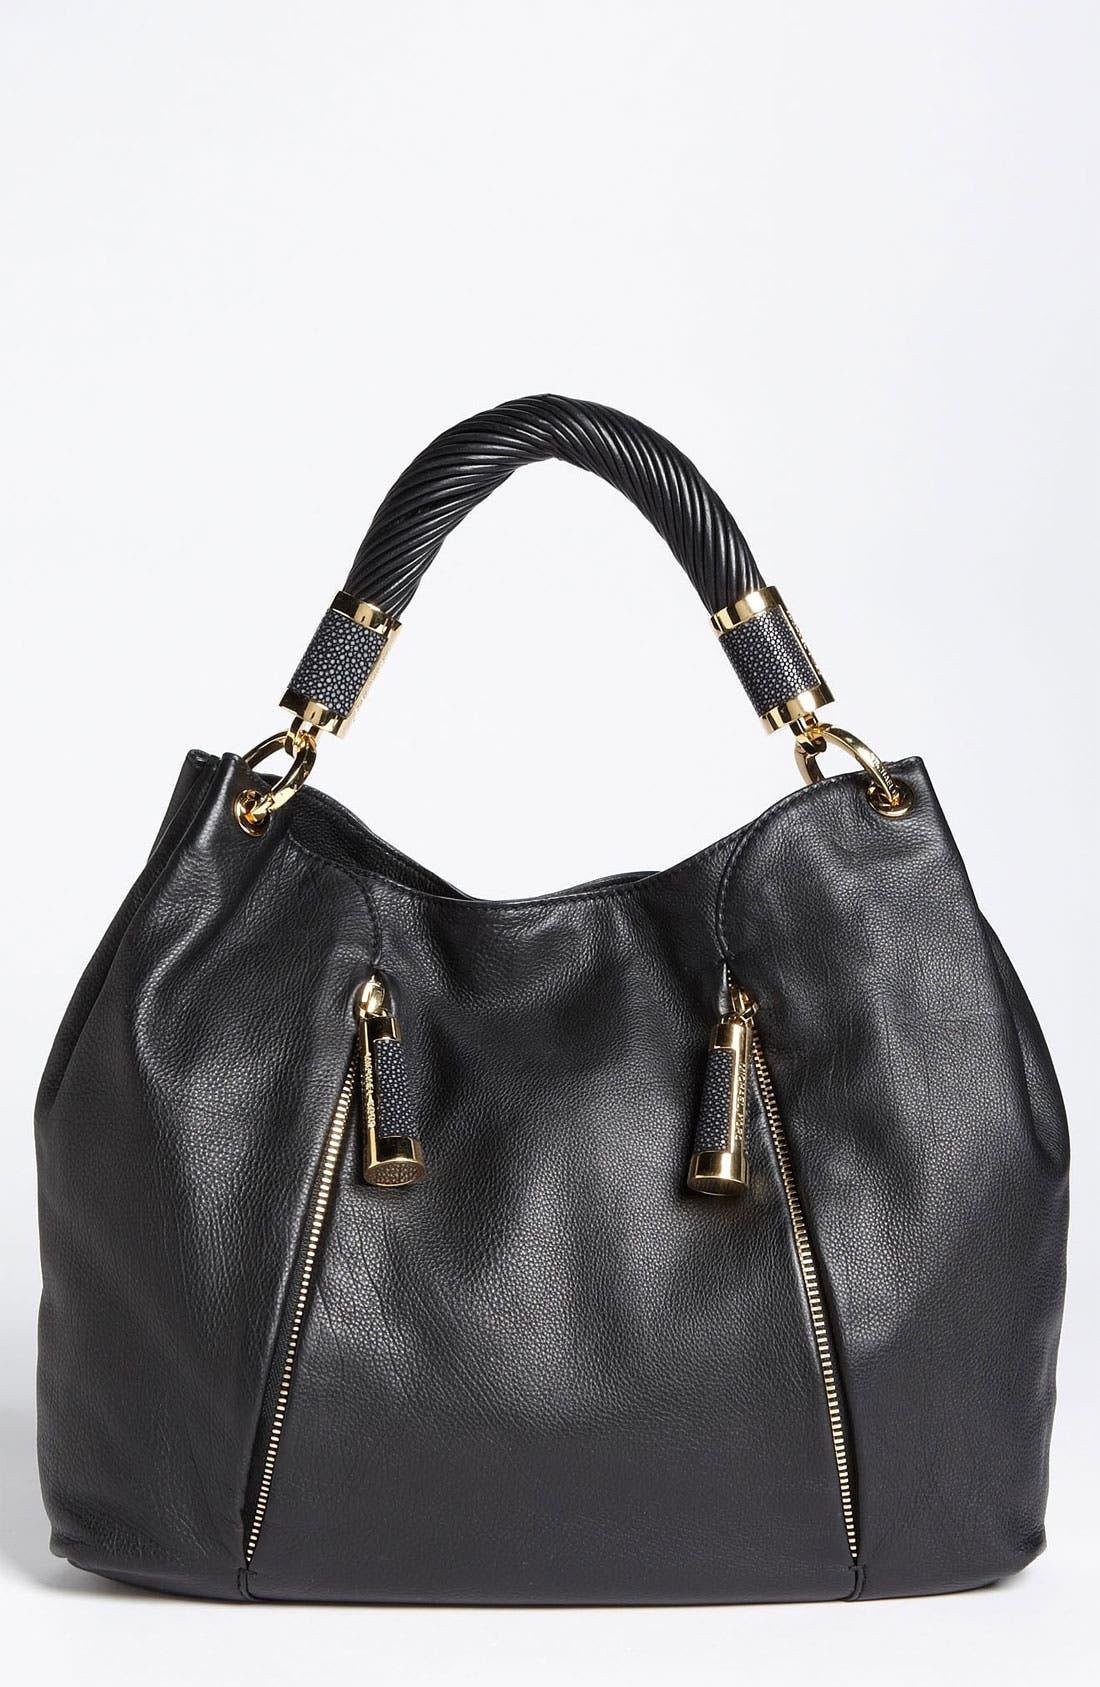 Main Image - Michael Kors 'Tonne' Leather Hobo